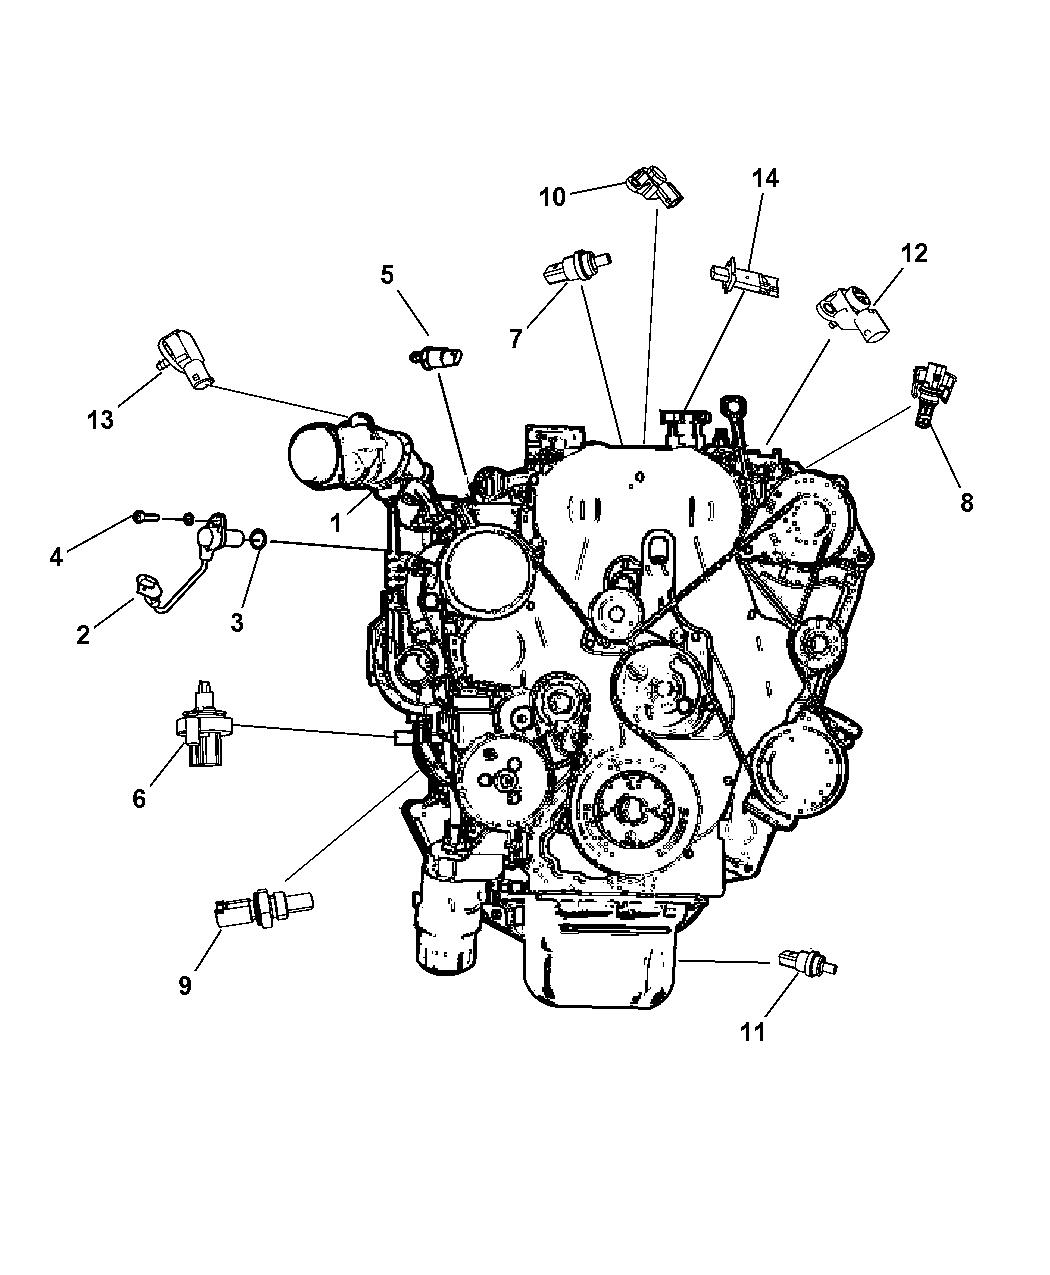 Jeep Patriot Sensor